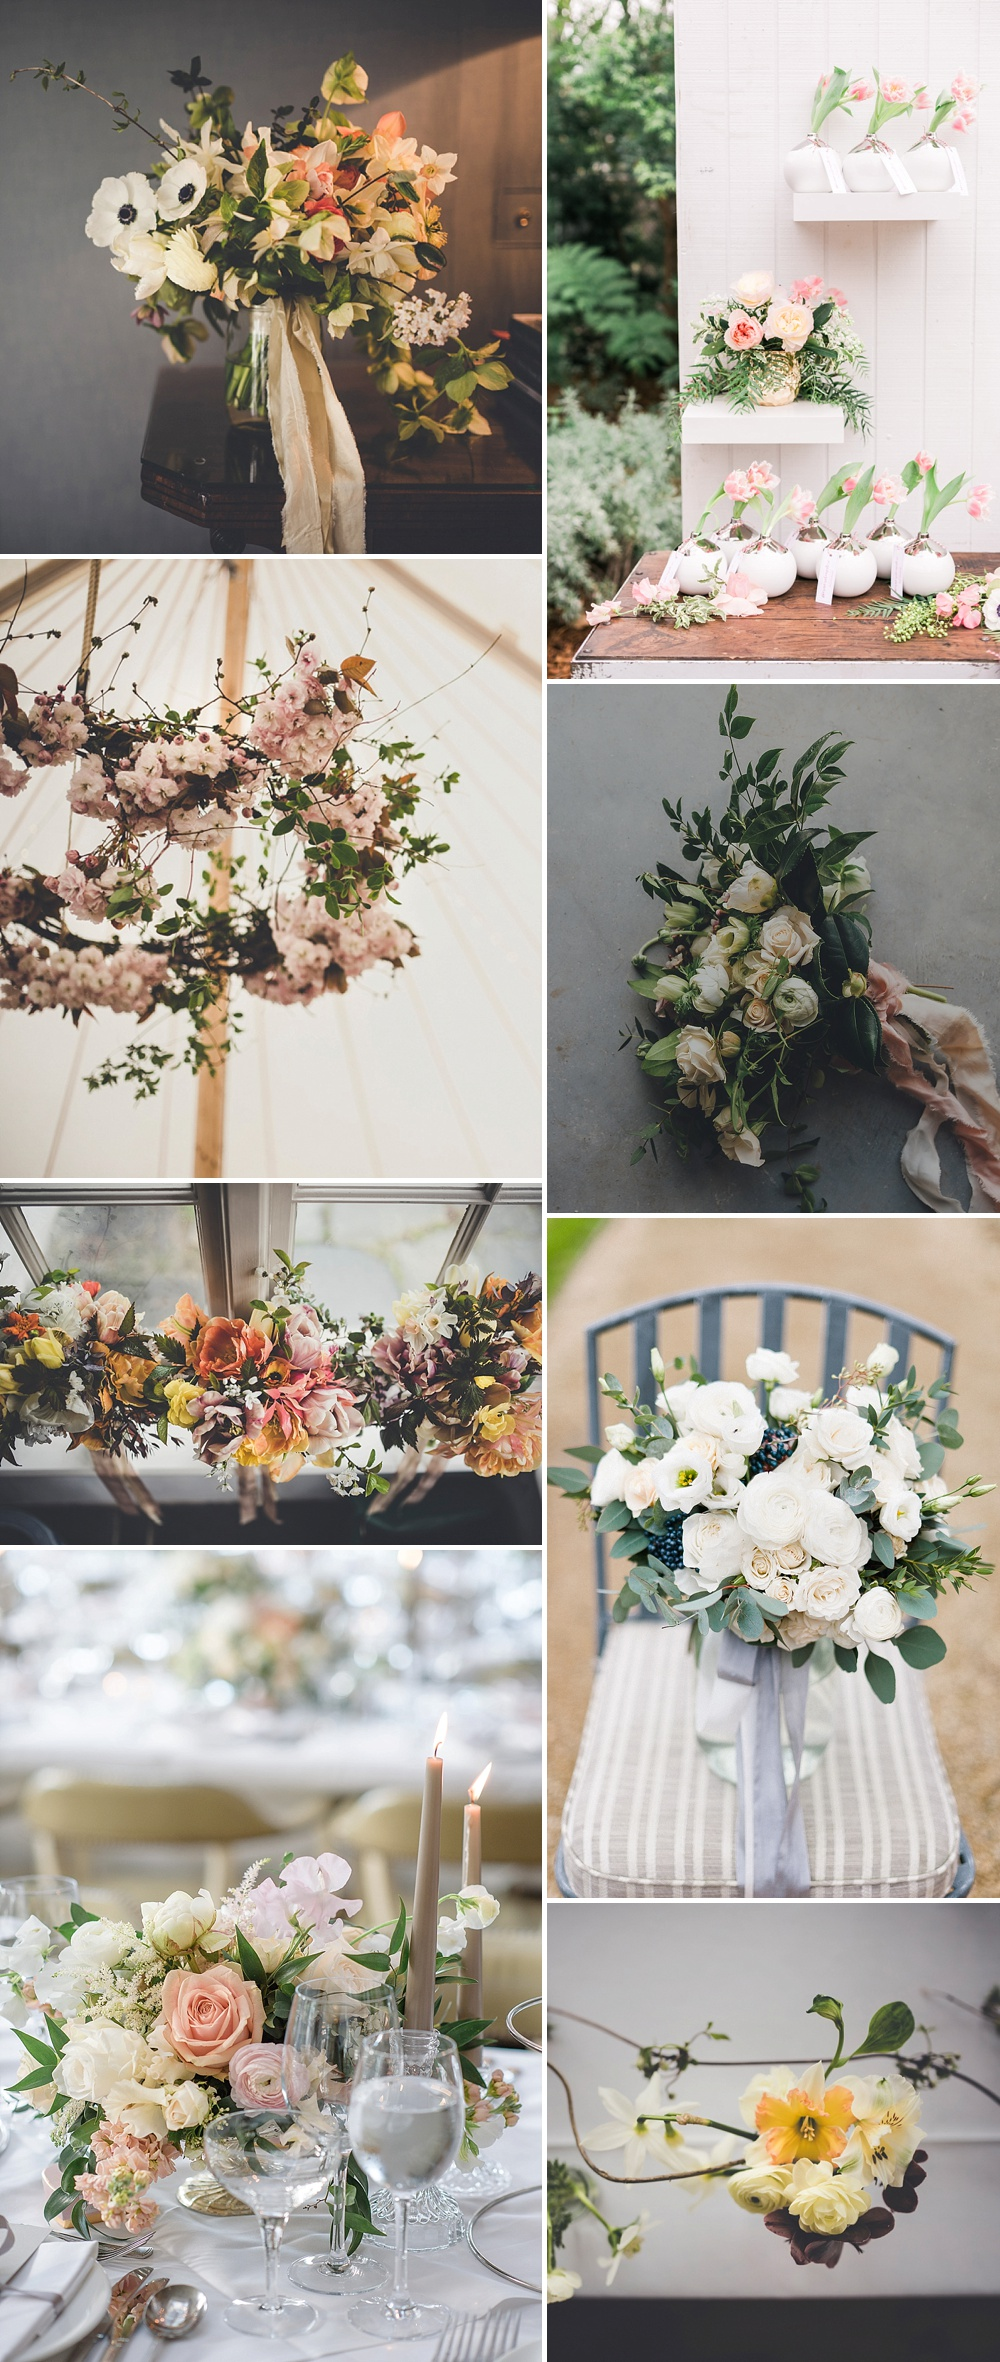 Spring Flower Wedding Inspiration From The Love Lust List